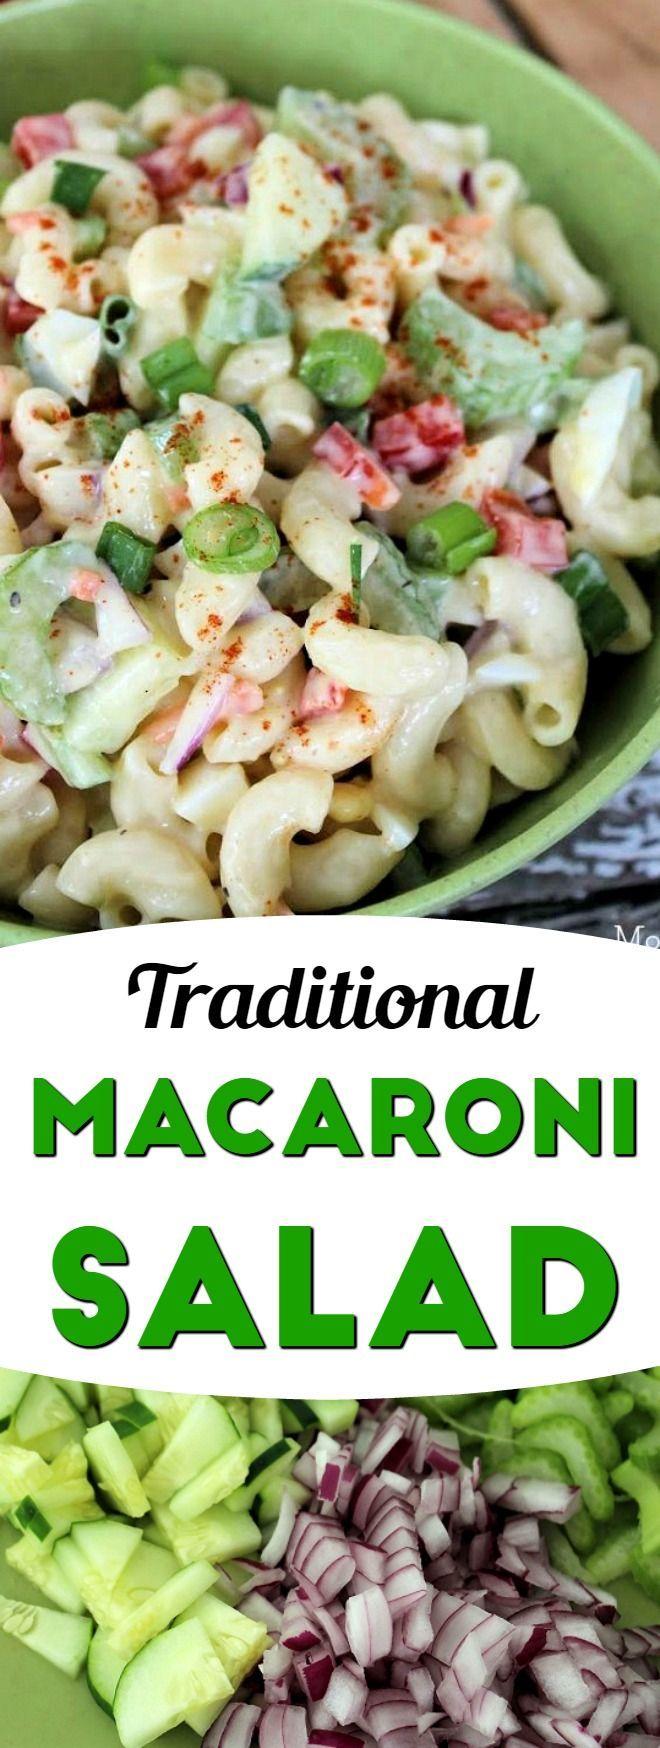 Traditional Macaroni Salad Recipe